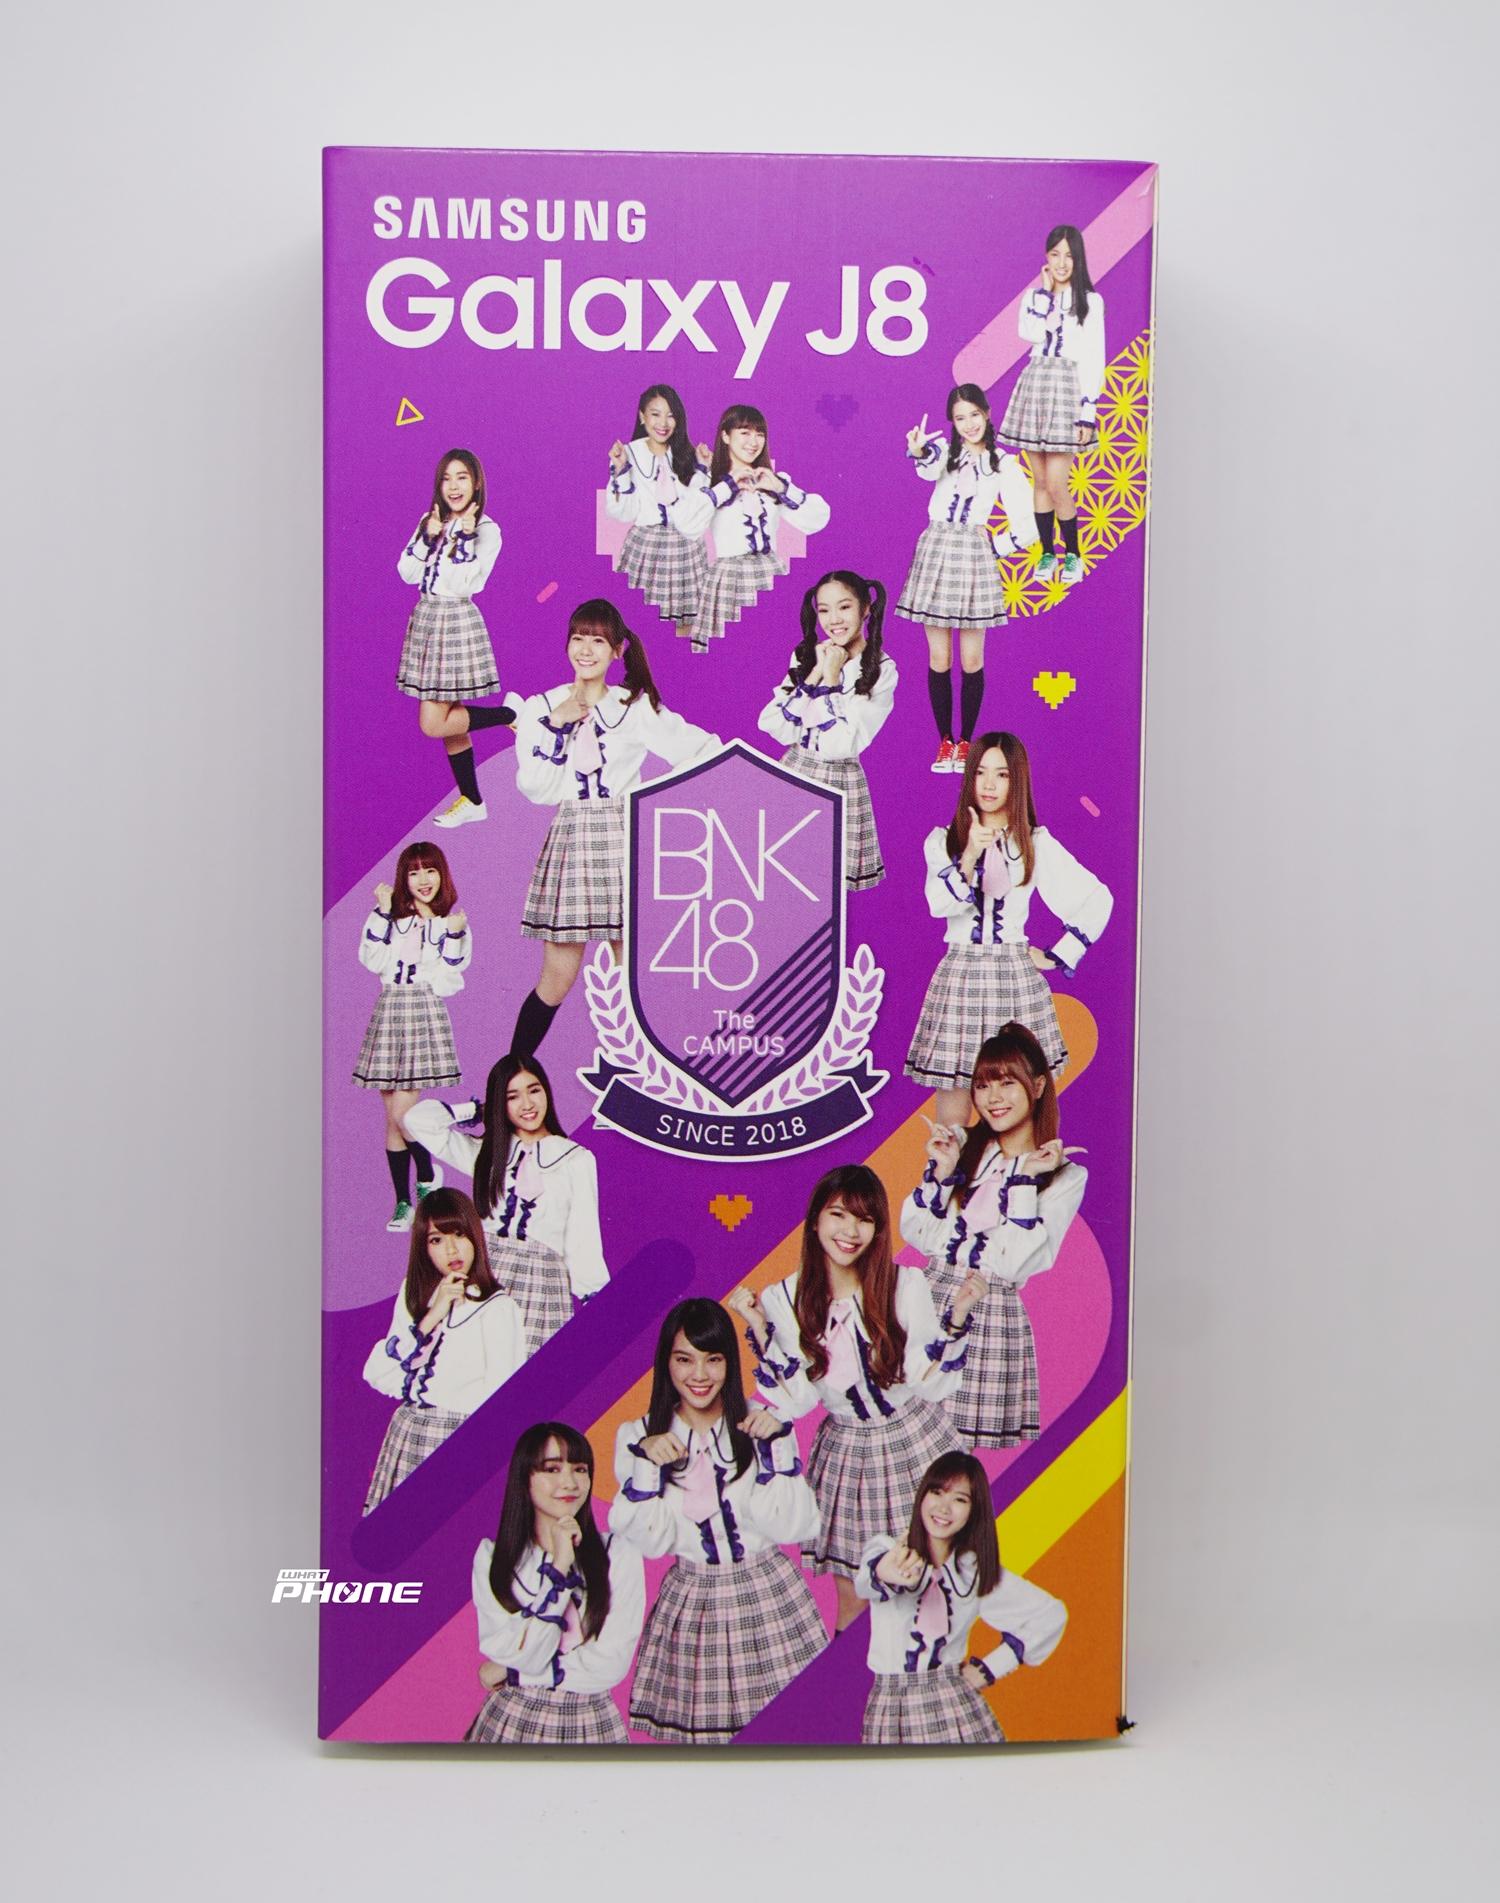 Samsung Galaxy J8 x BNK48 Limited Edition BOXSET Unboxing (34)